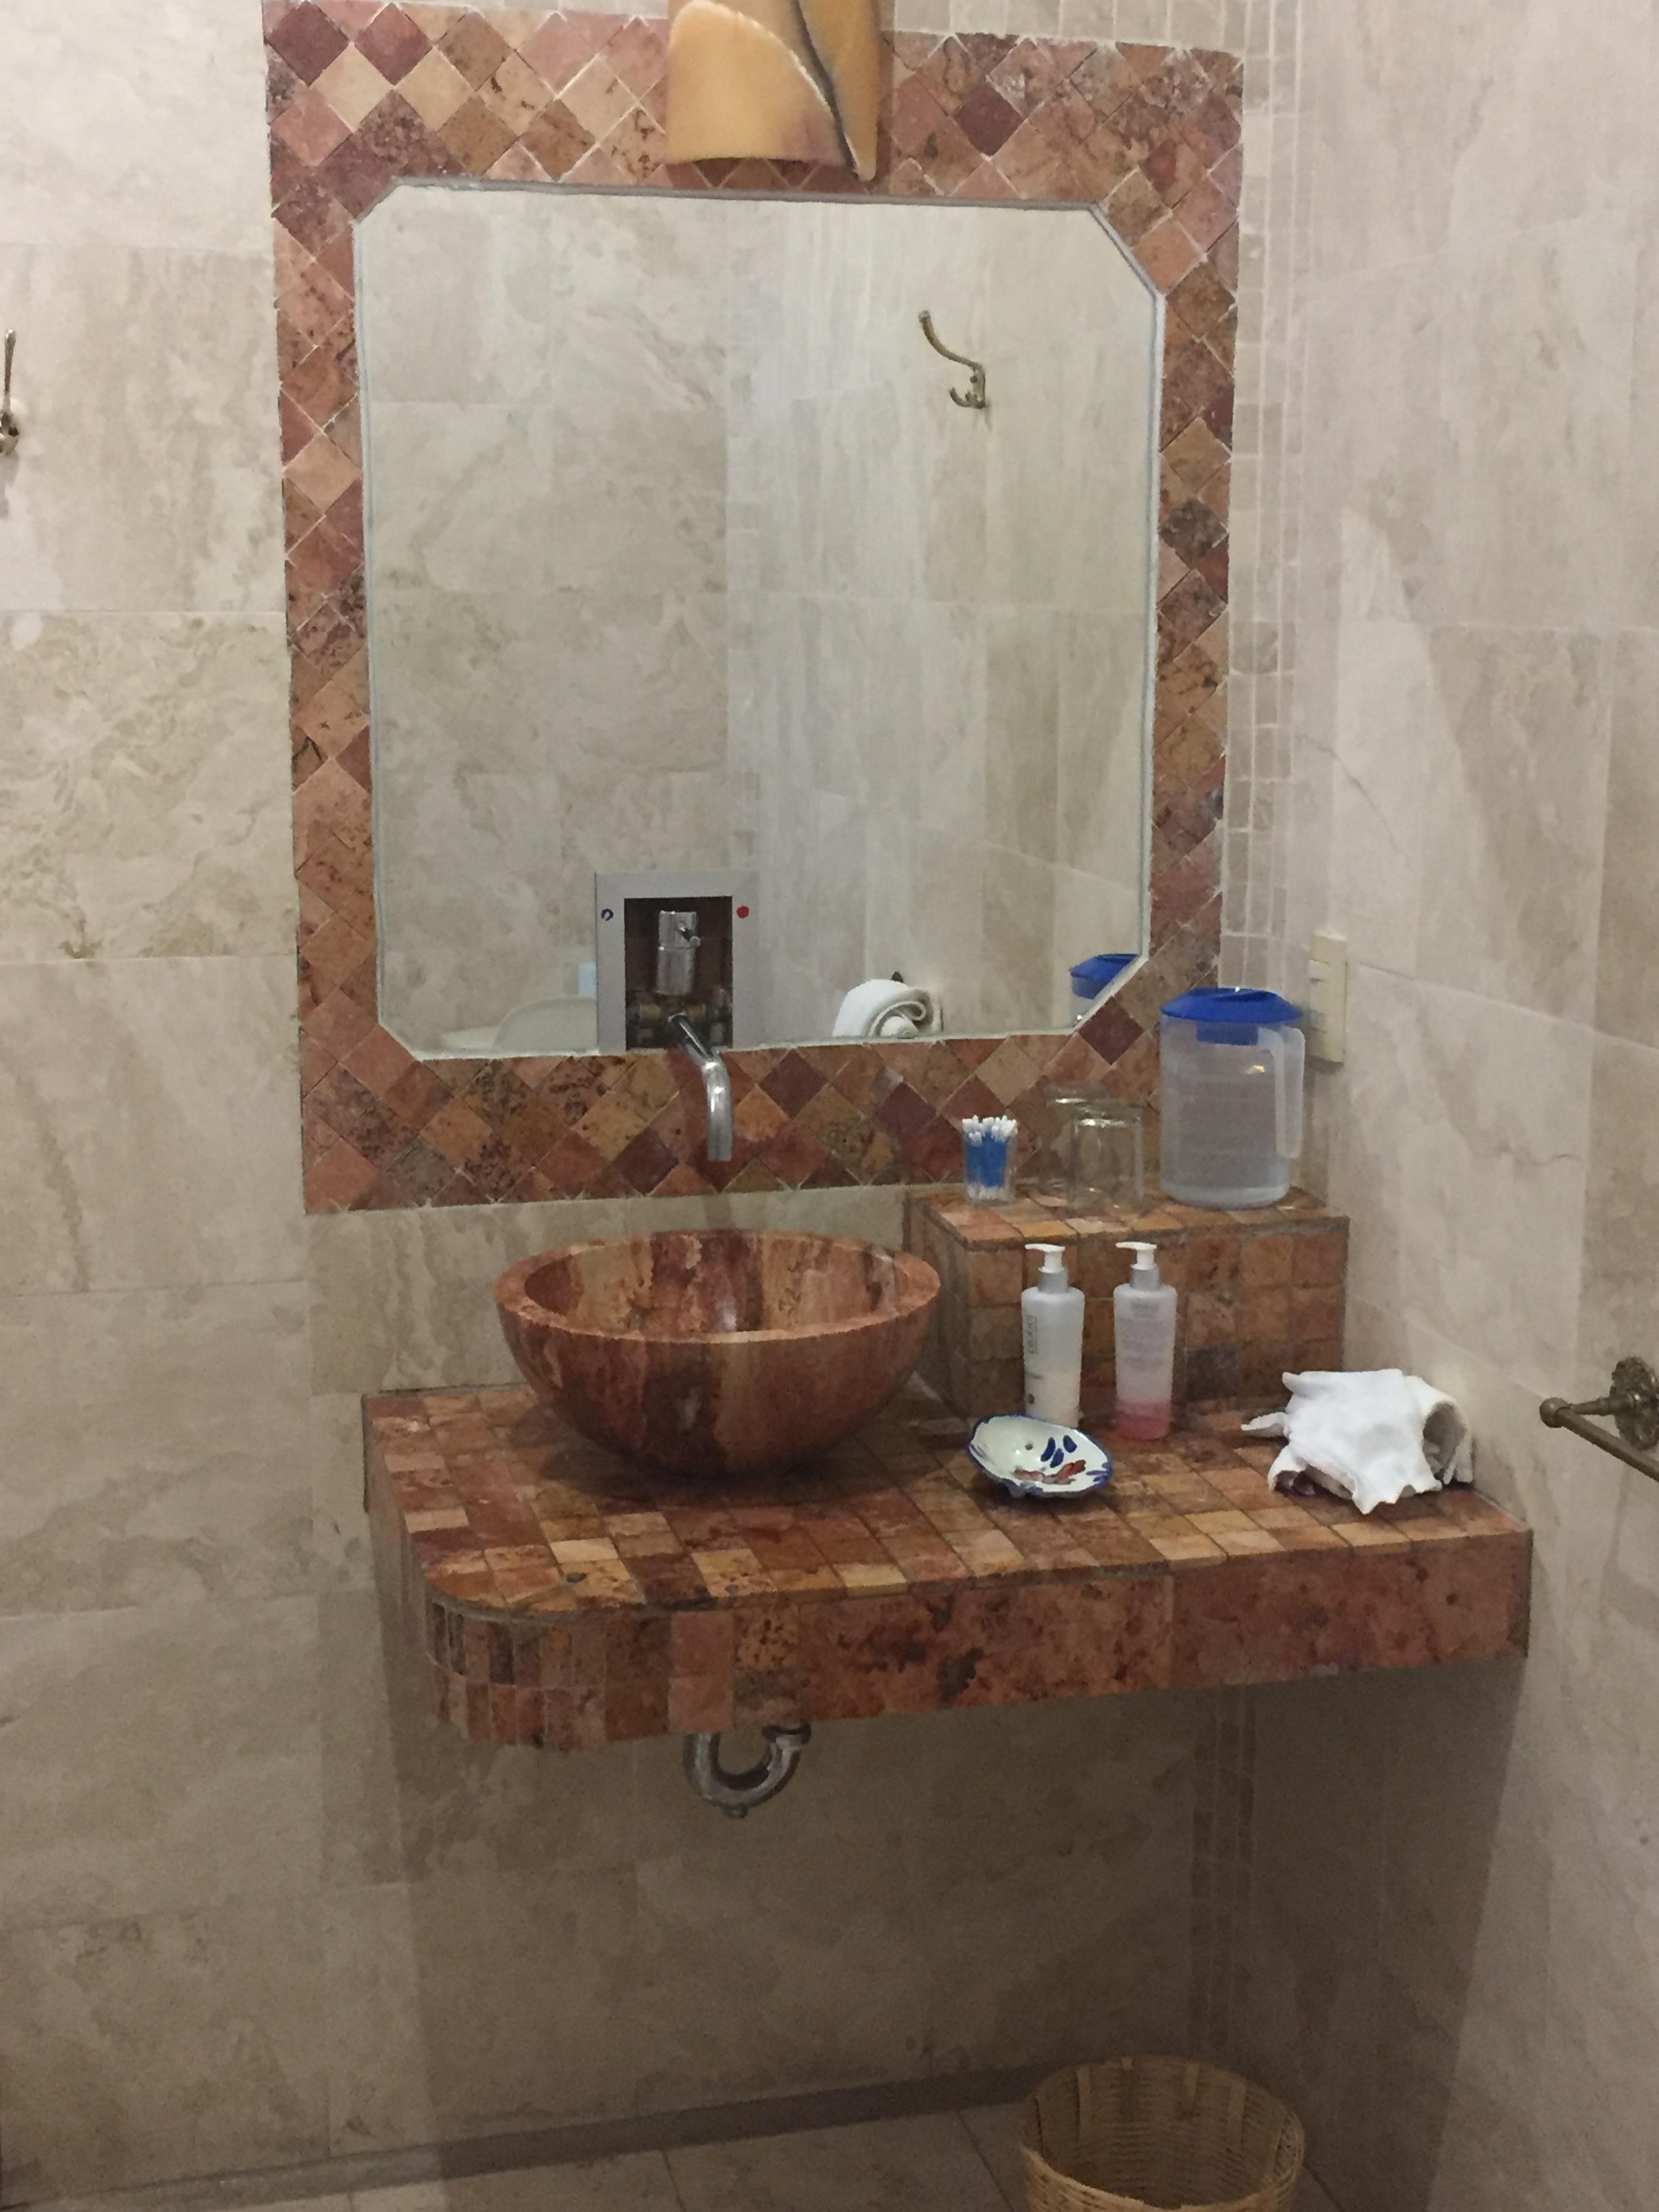 Xquenda Huatulco Spa Hotel Reviews | Expedia